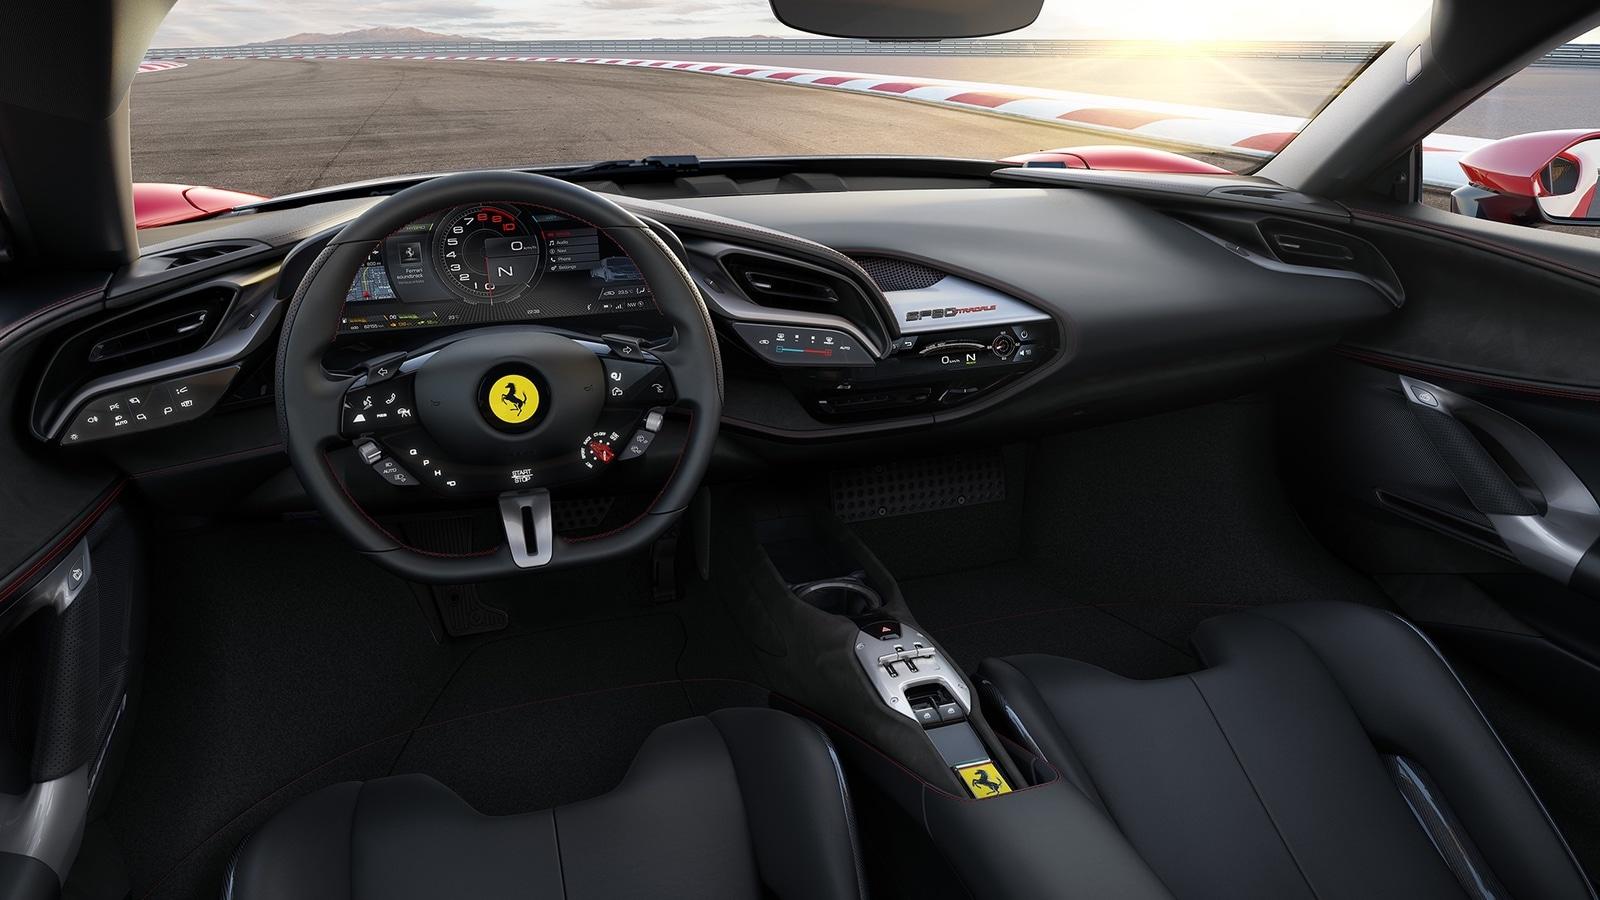 Ferrari SF90 Stradale – 1000 CV Hybrid (0-100 in 2.5 sec) 4